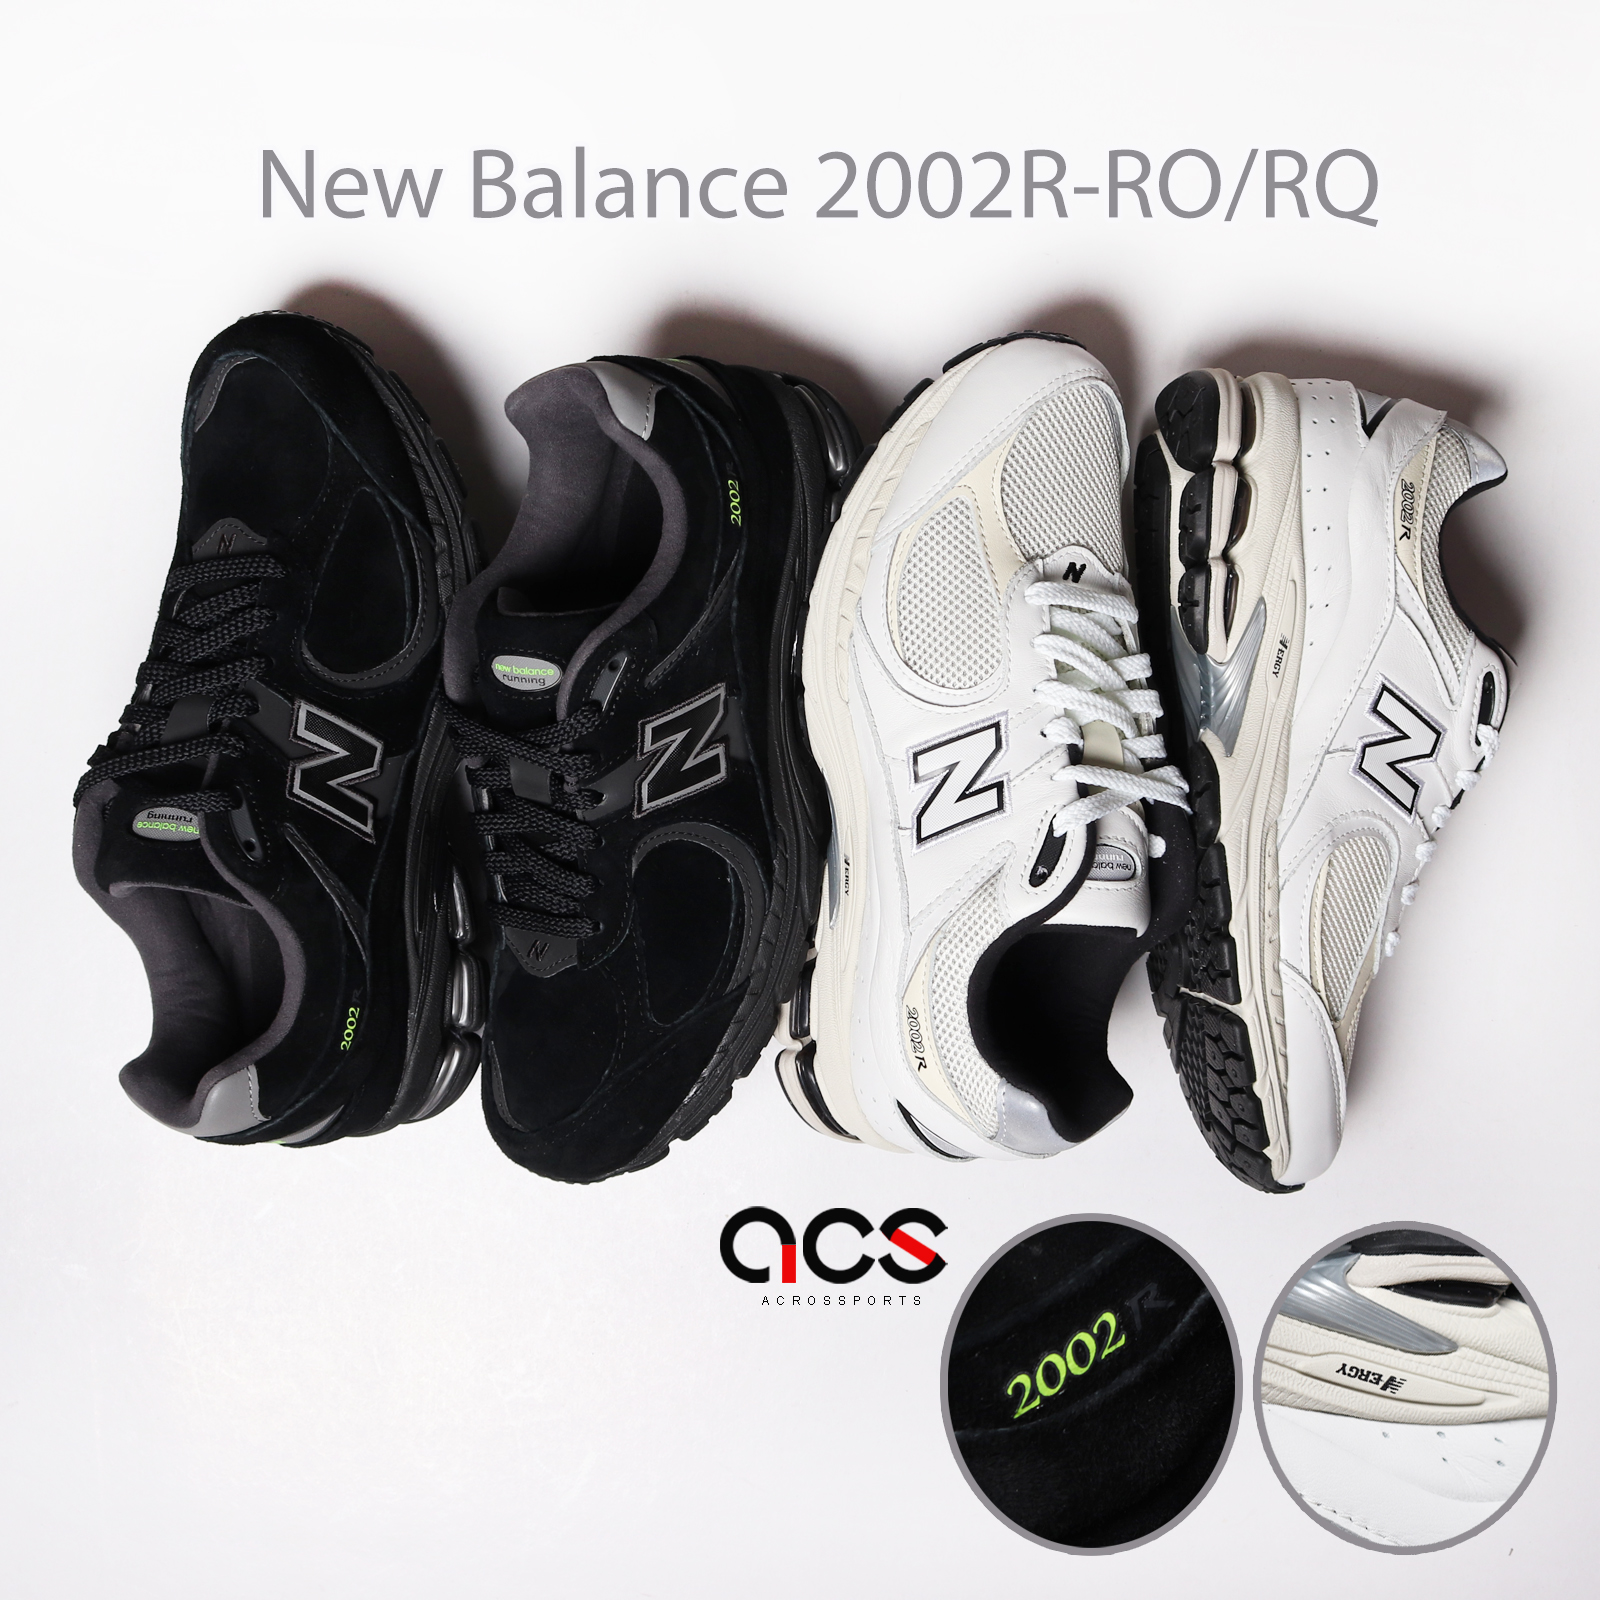 New Balance 復古慢跑鞋 2002R 男 女 全尺段 美製腳感 緩震 休閒 情侶鞋 運動鞋 任選【ACS】